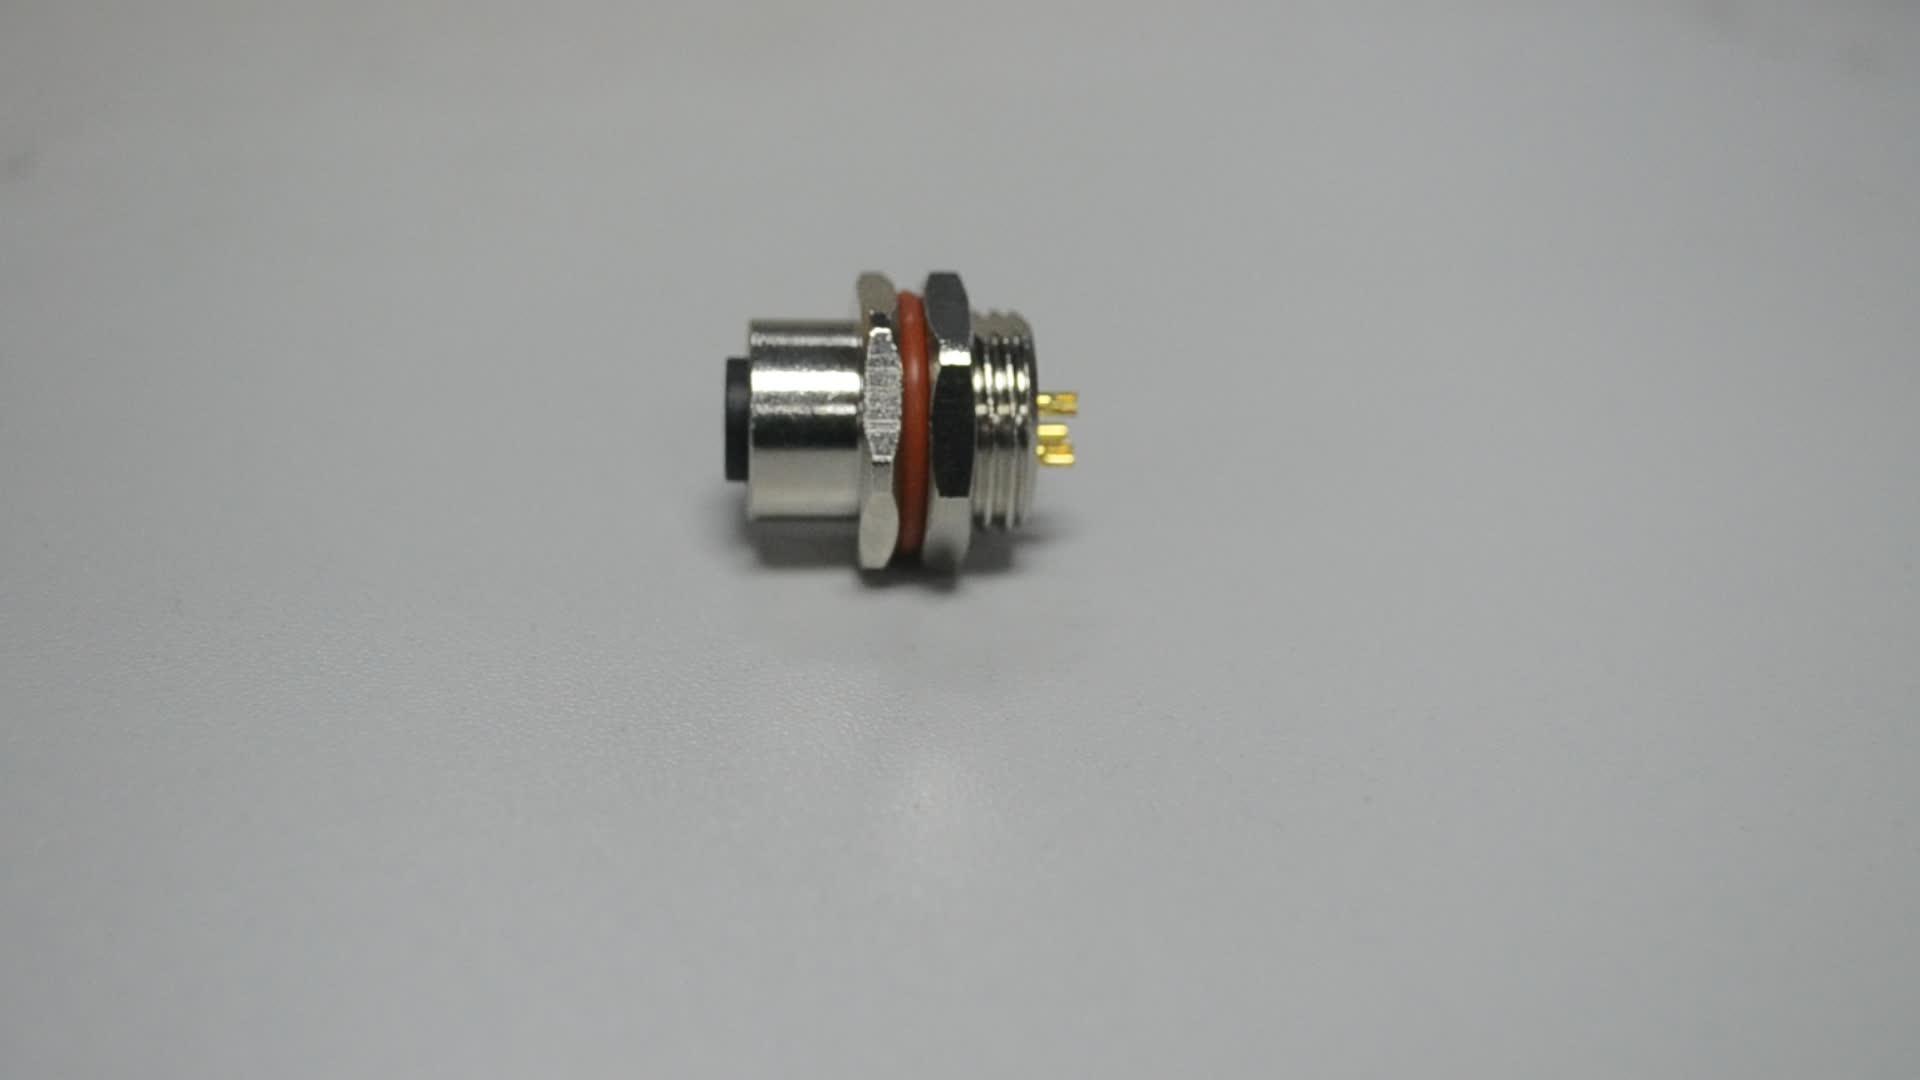 Panel mount 3Pin Splitter M12 Circular Connector